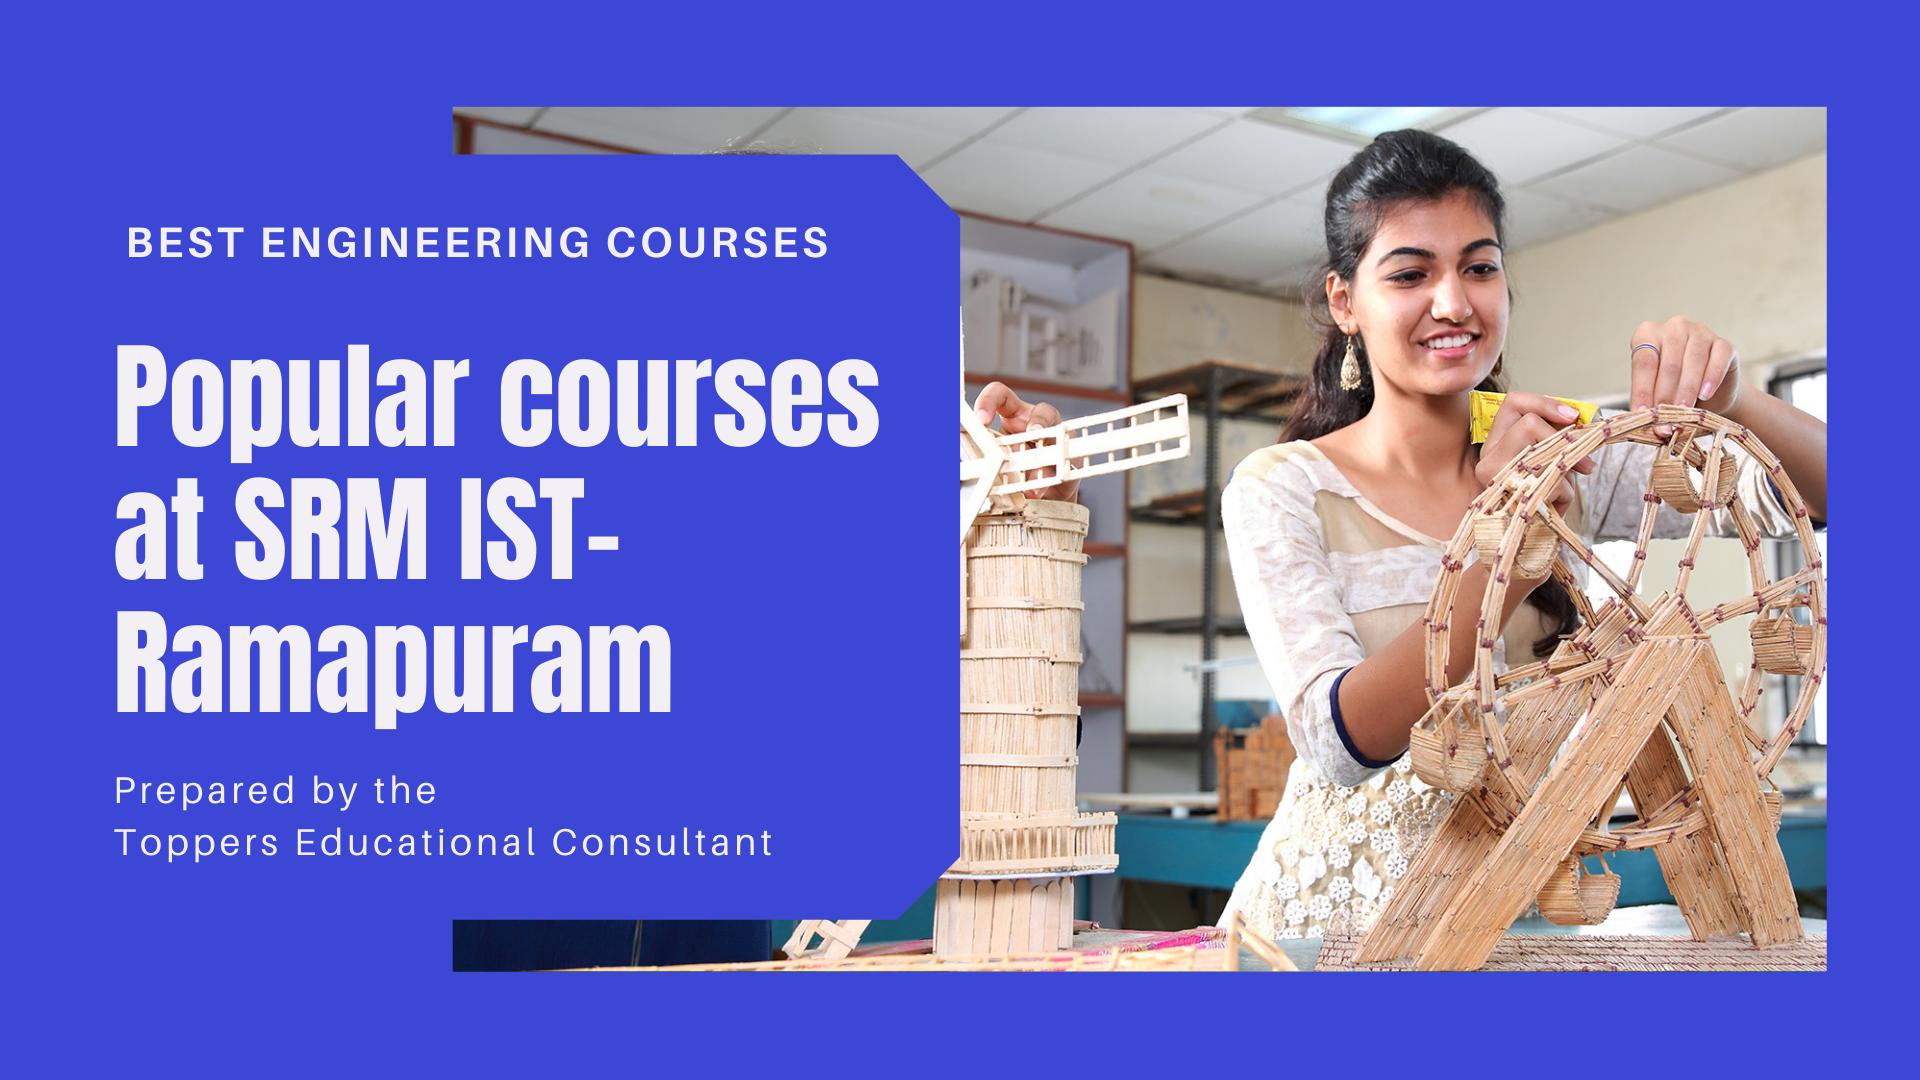 Popular courses at SRM IST- Ramapuram